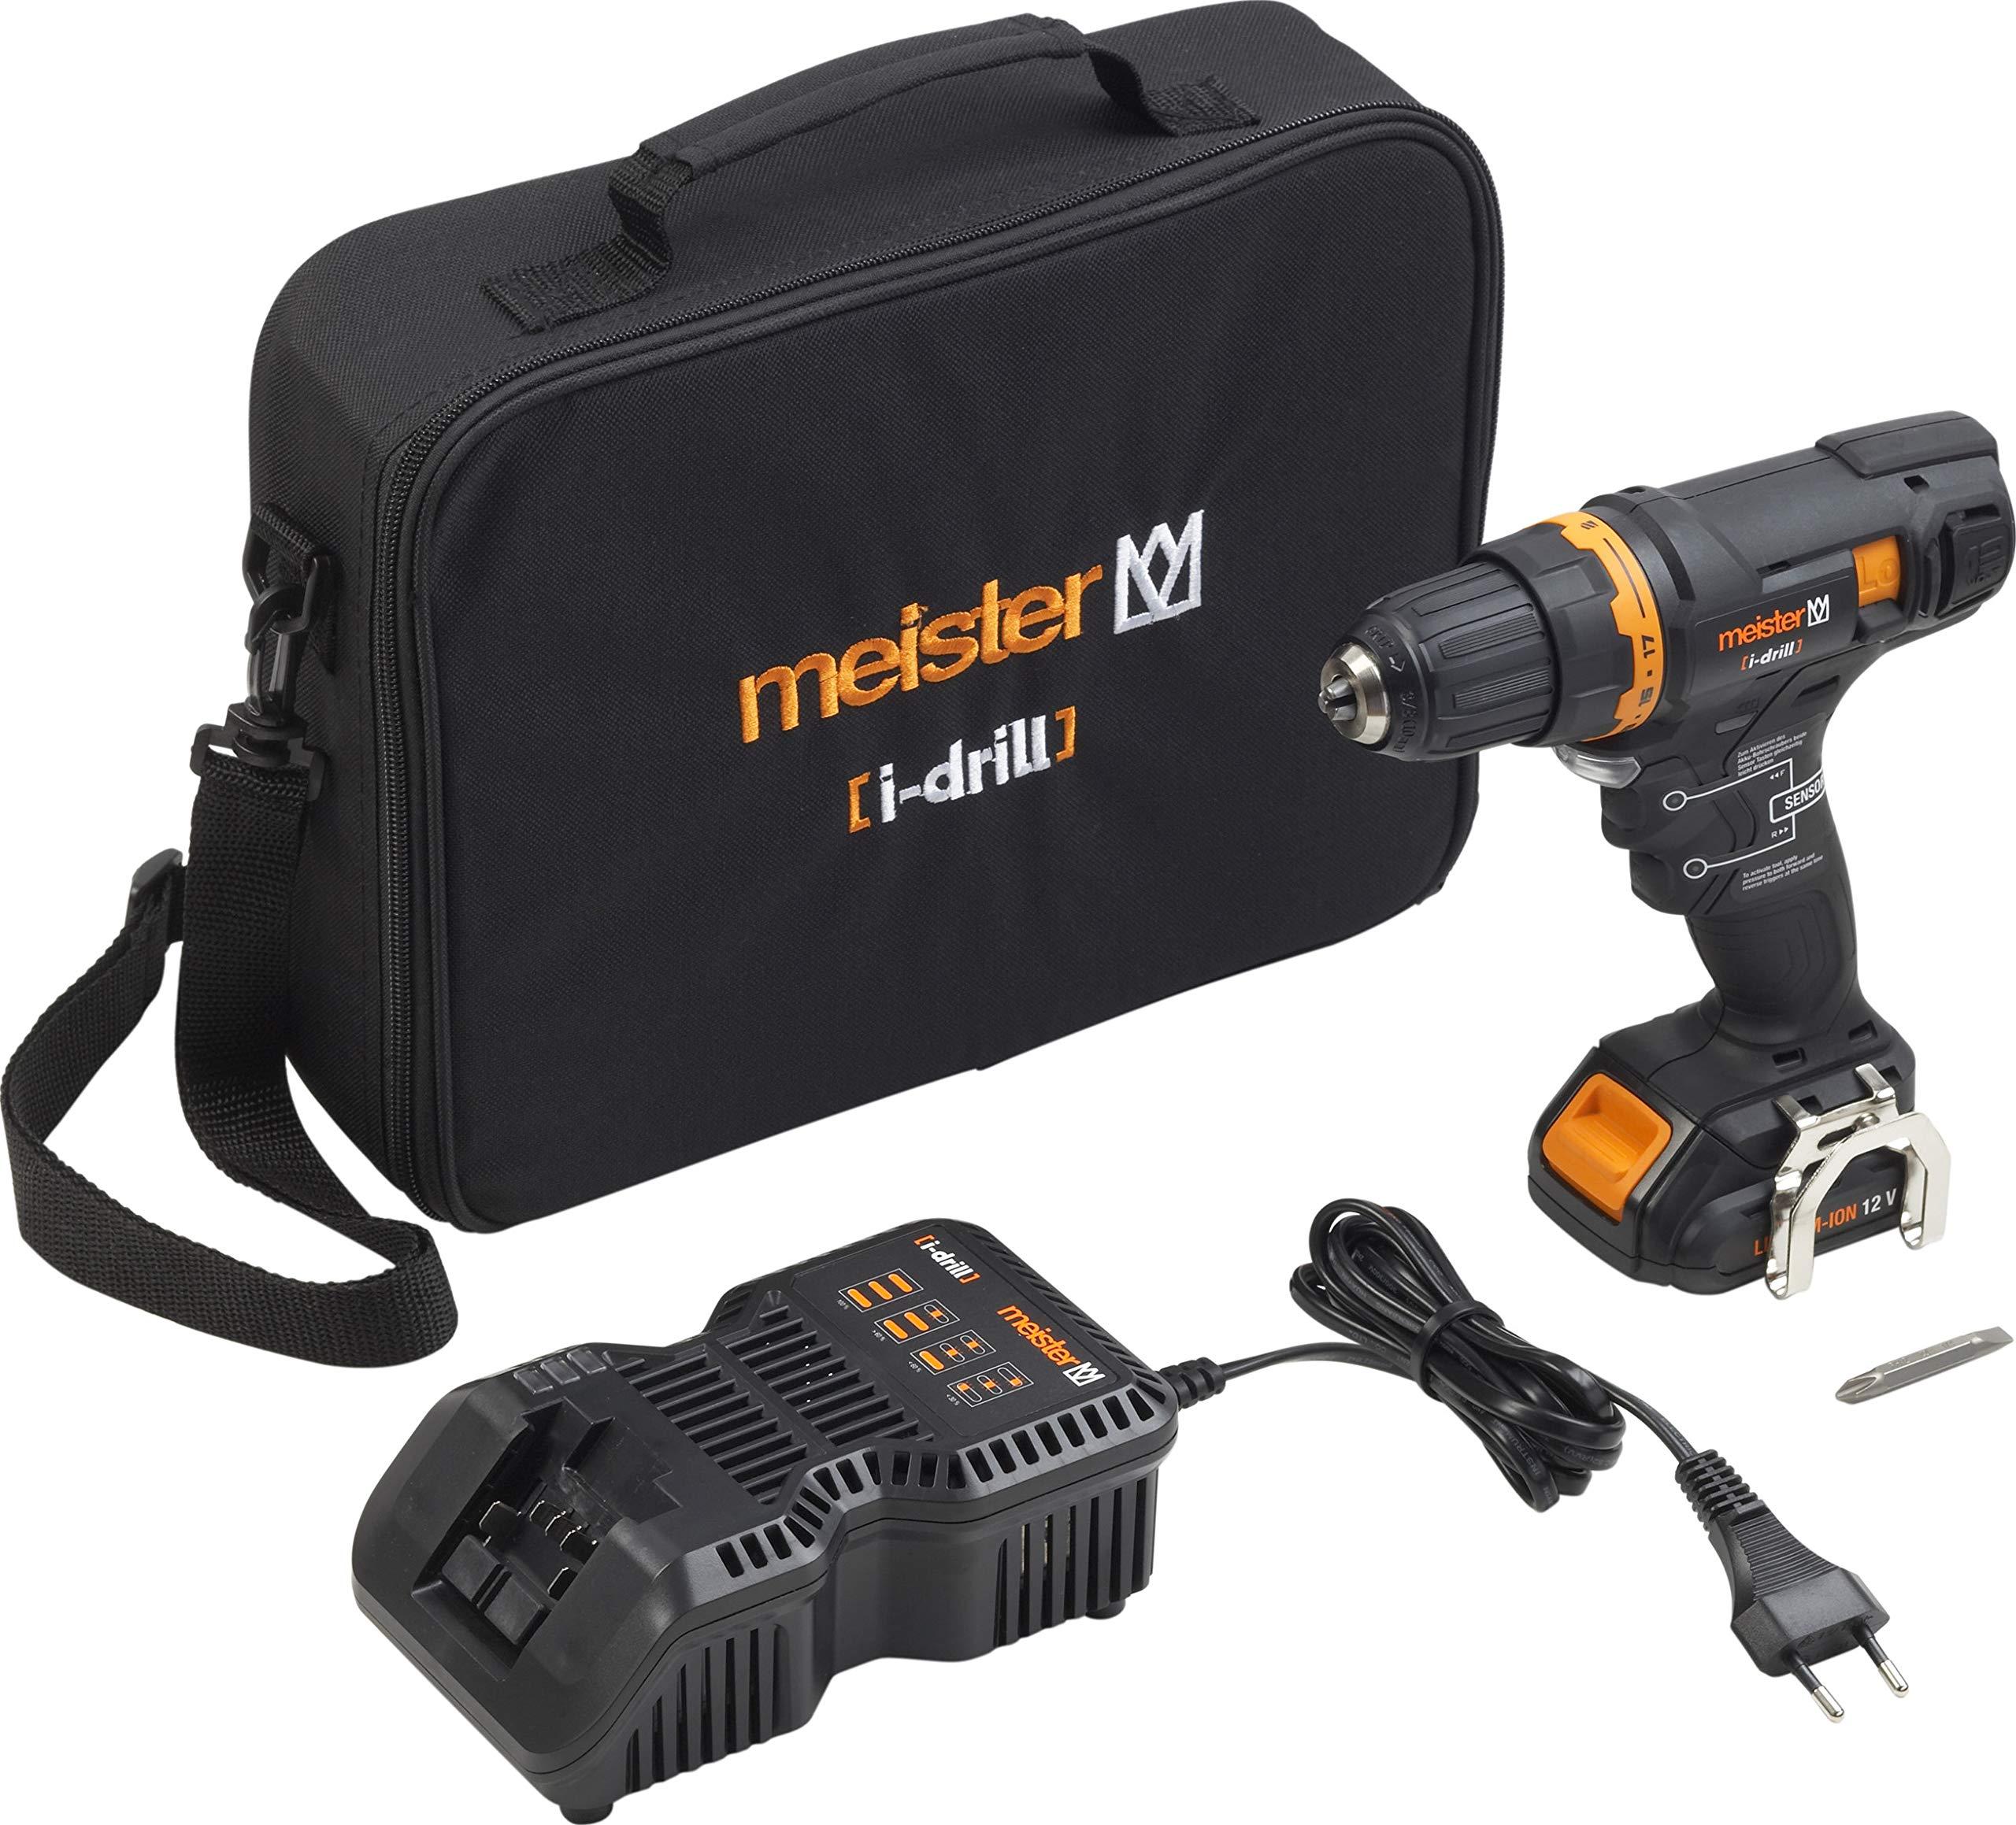 Meister-Akkubohrschrauber-i-drill-Sensor-12-V-20-Ah-Akku-2-Gang-Getriebe-Schnellspannbohrfutter-30-Nm-Drehmoment-Akkuschrauber-mit-Arbeitsleuchte-Bohrschrauber-in-Textiltasche-5450560